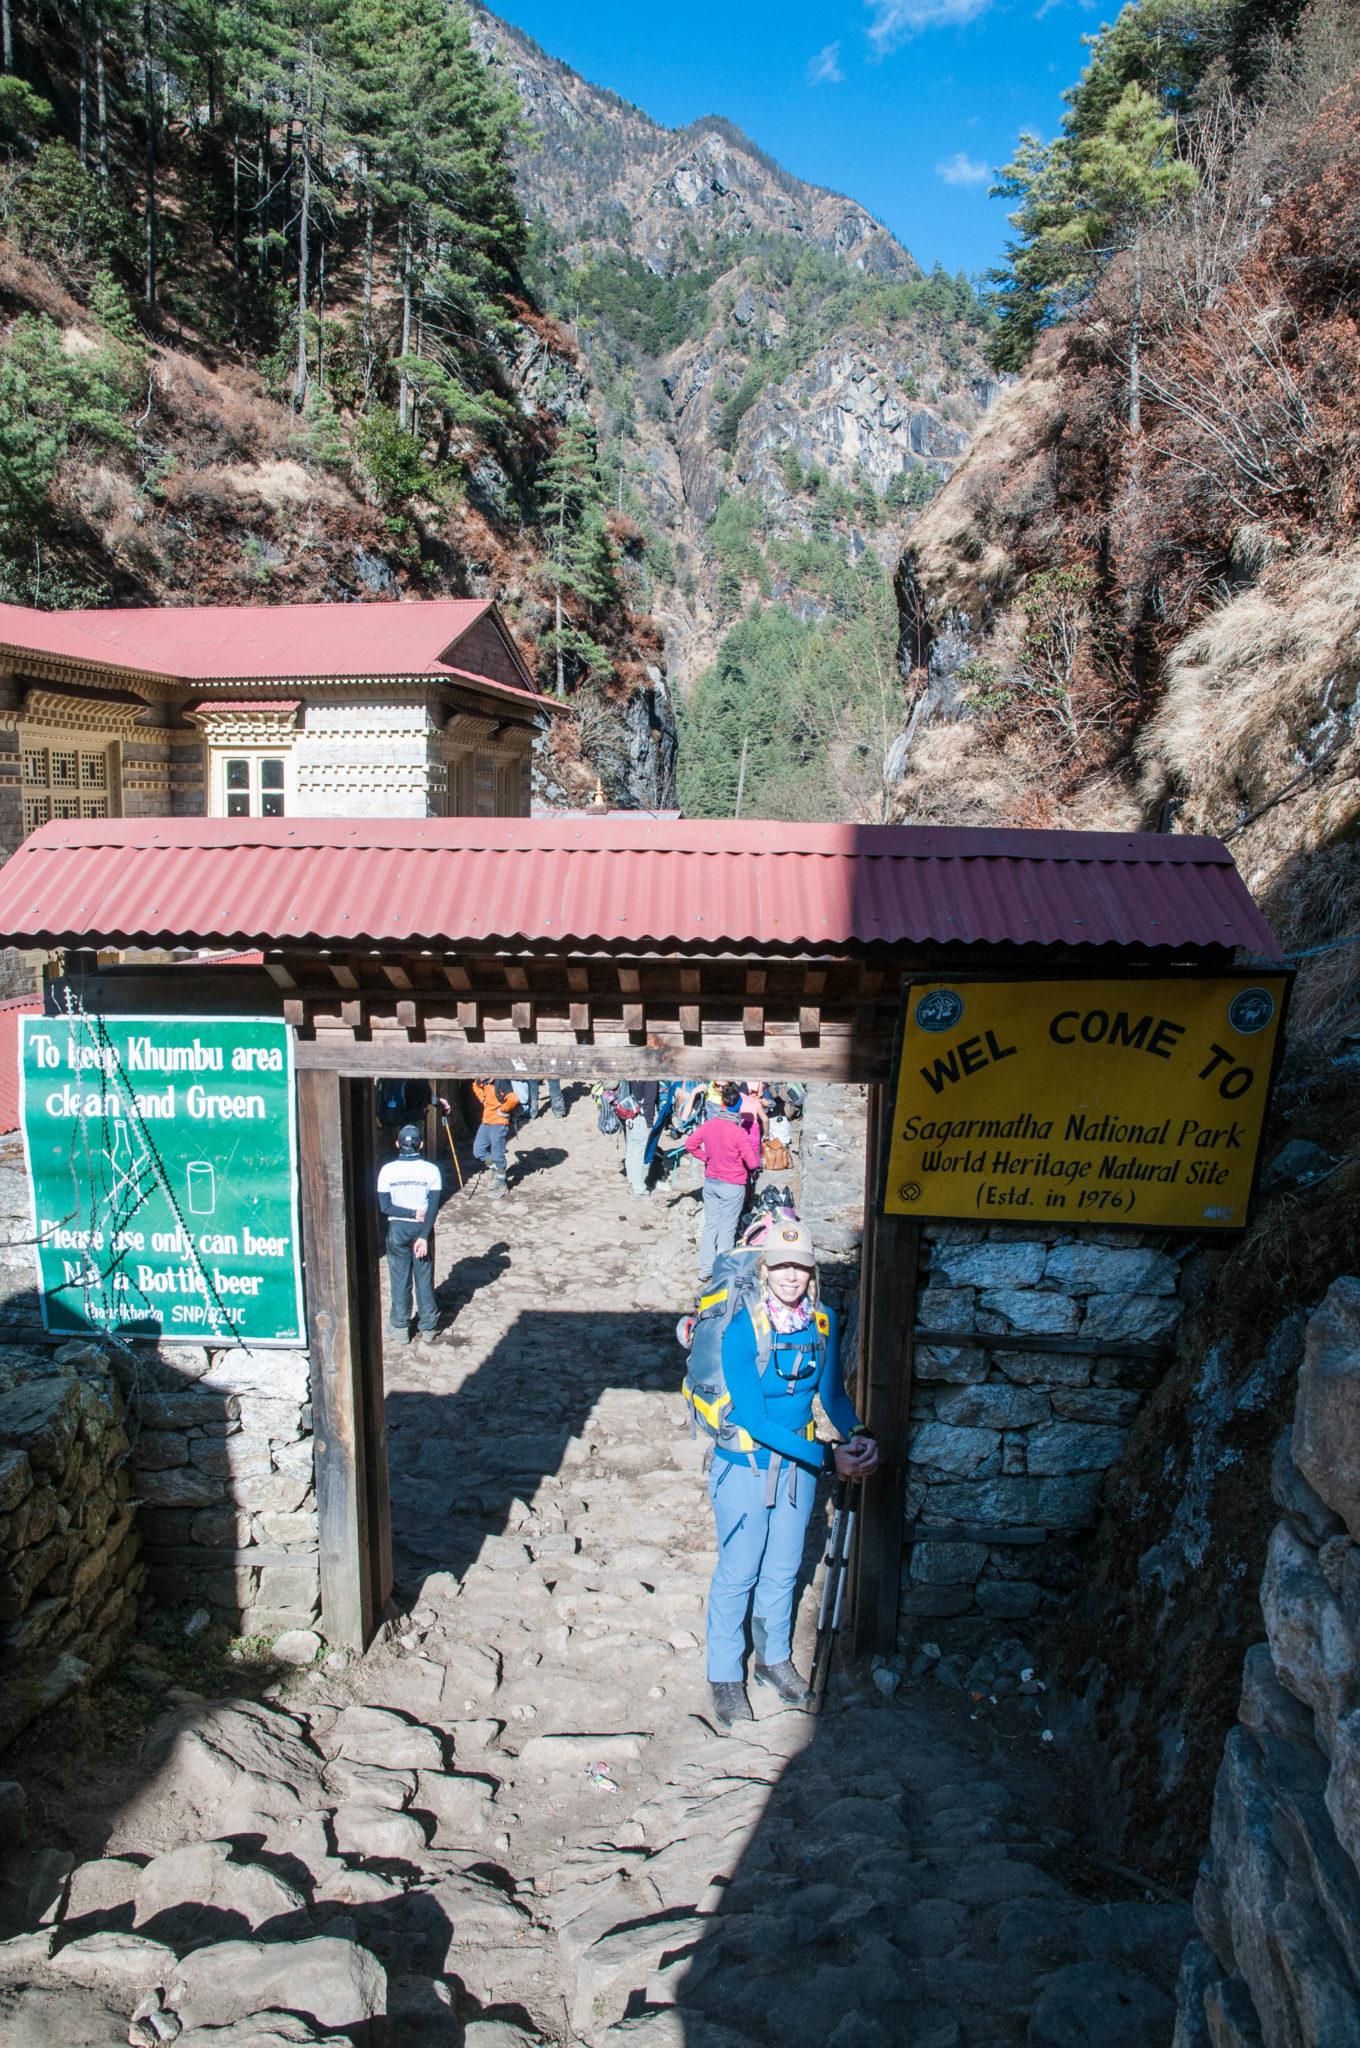 Gateway to the Sagarmatha National Park